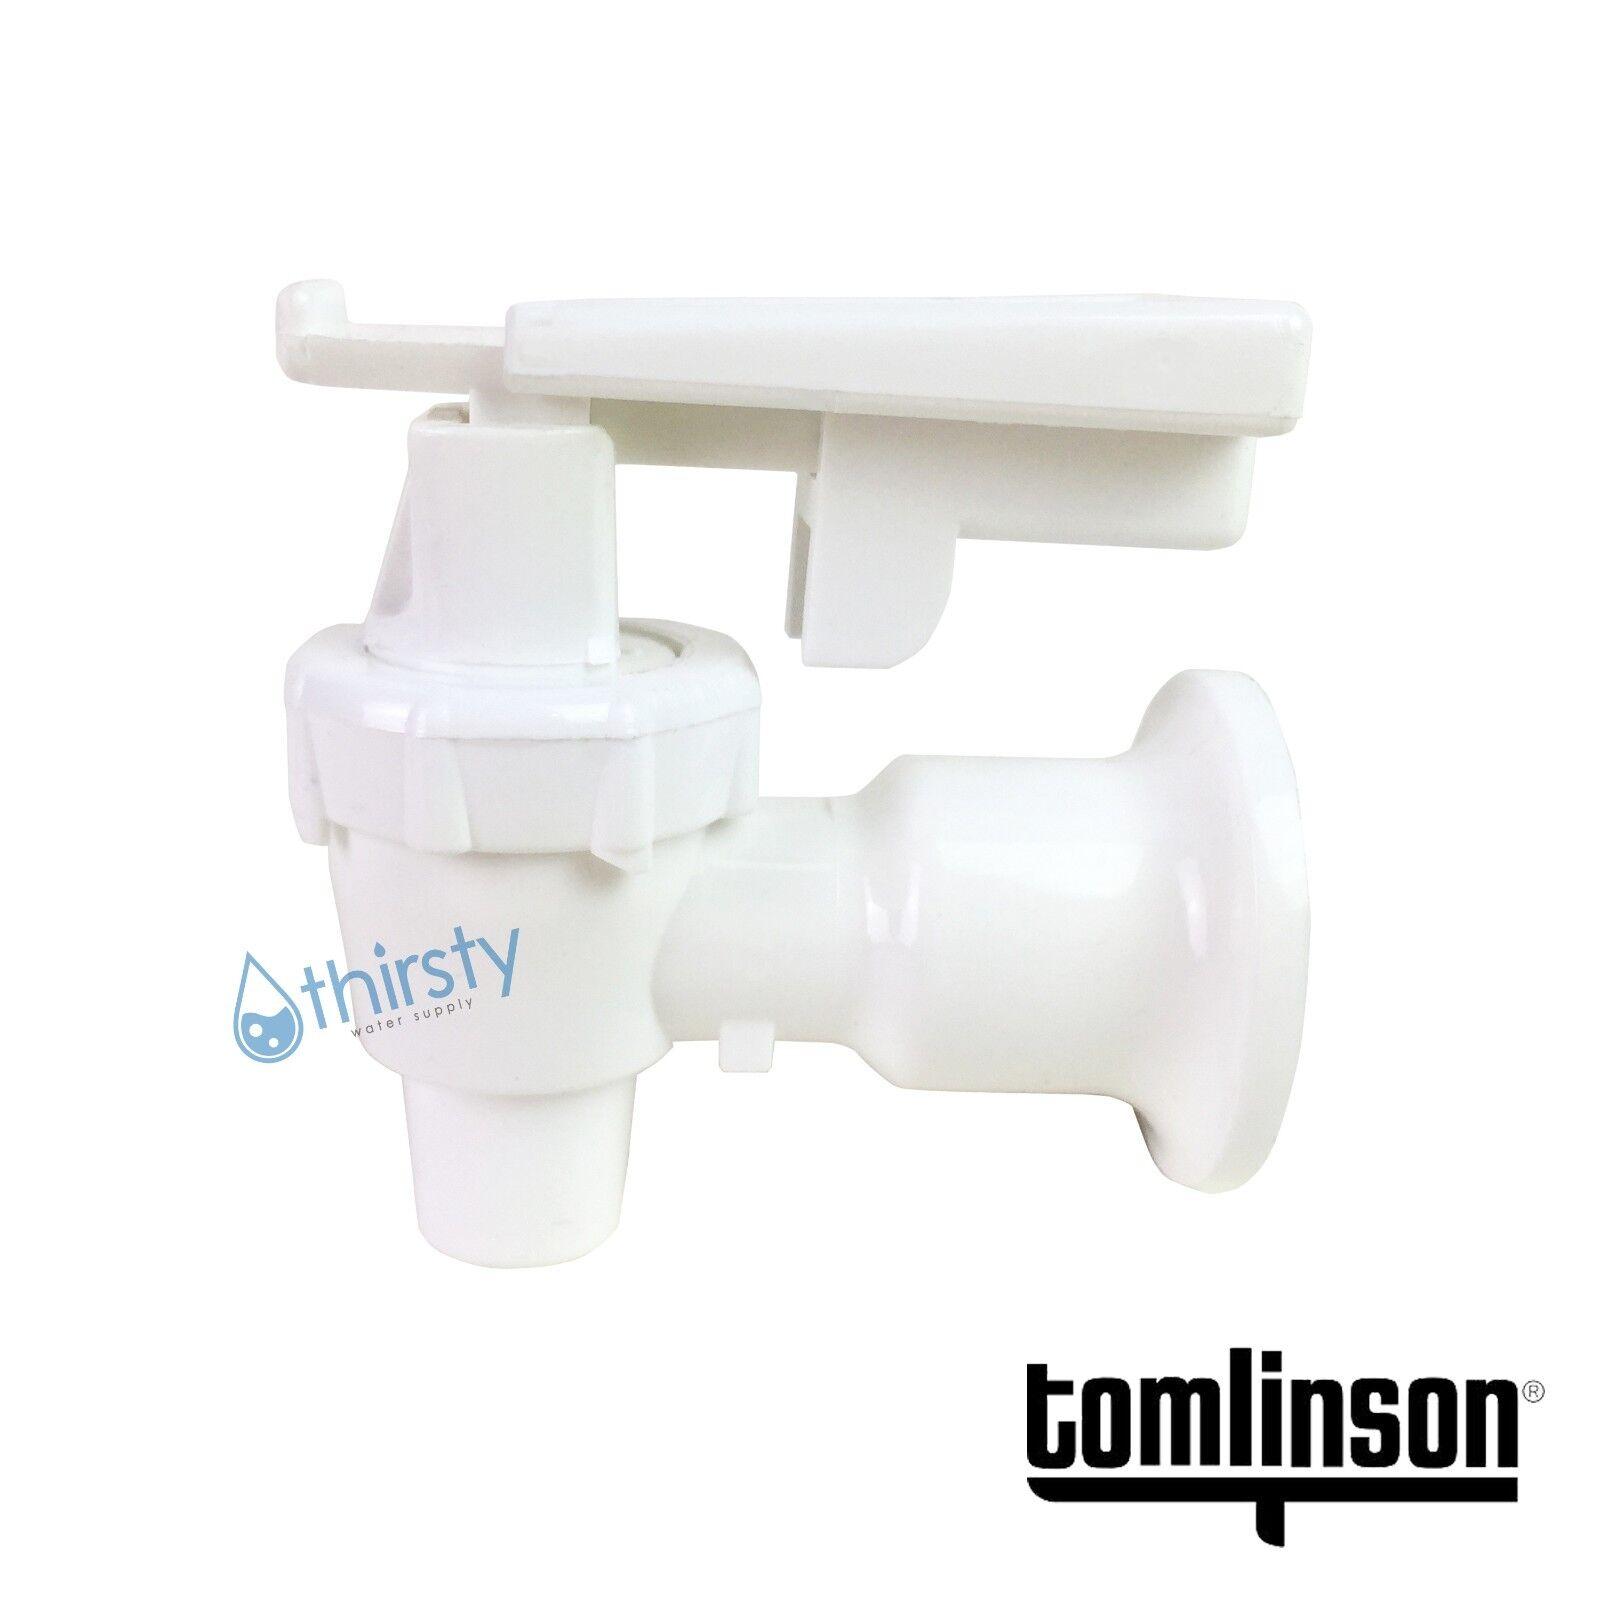 Tomlinson Water Cooler Faucet Spigot Dispenser Valve White Safety ...